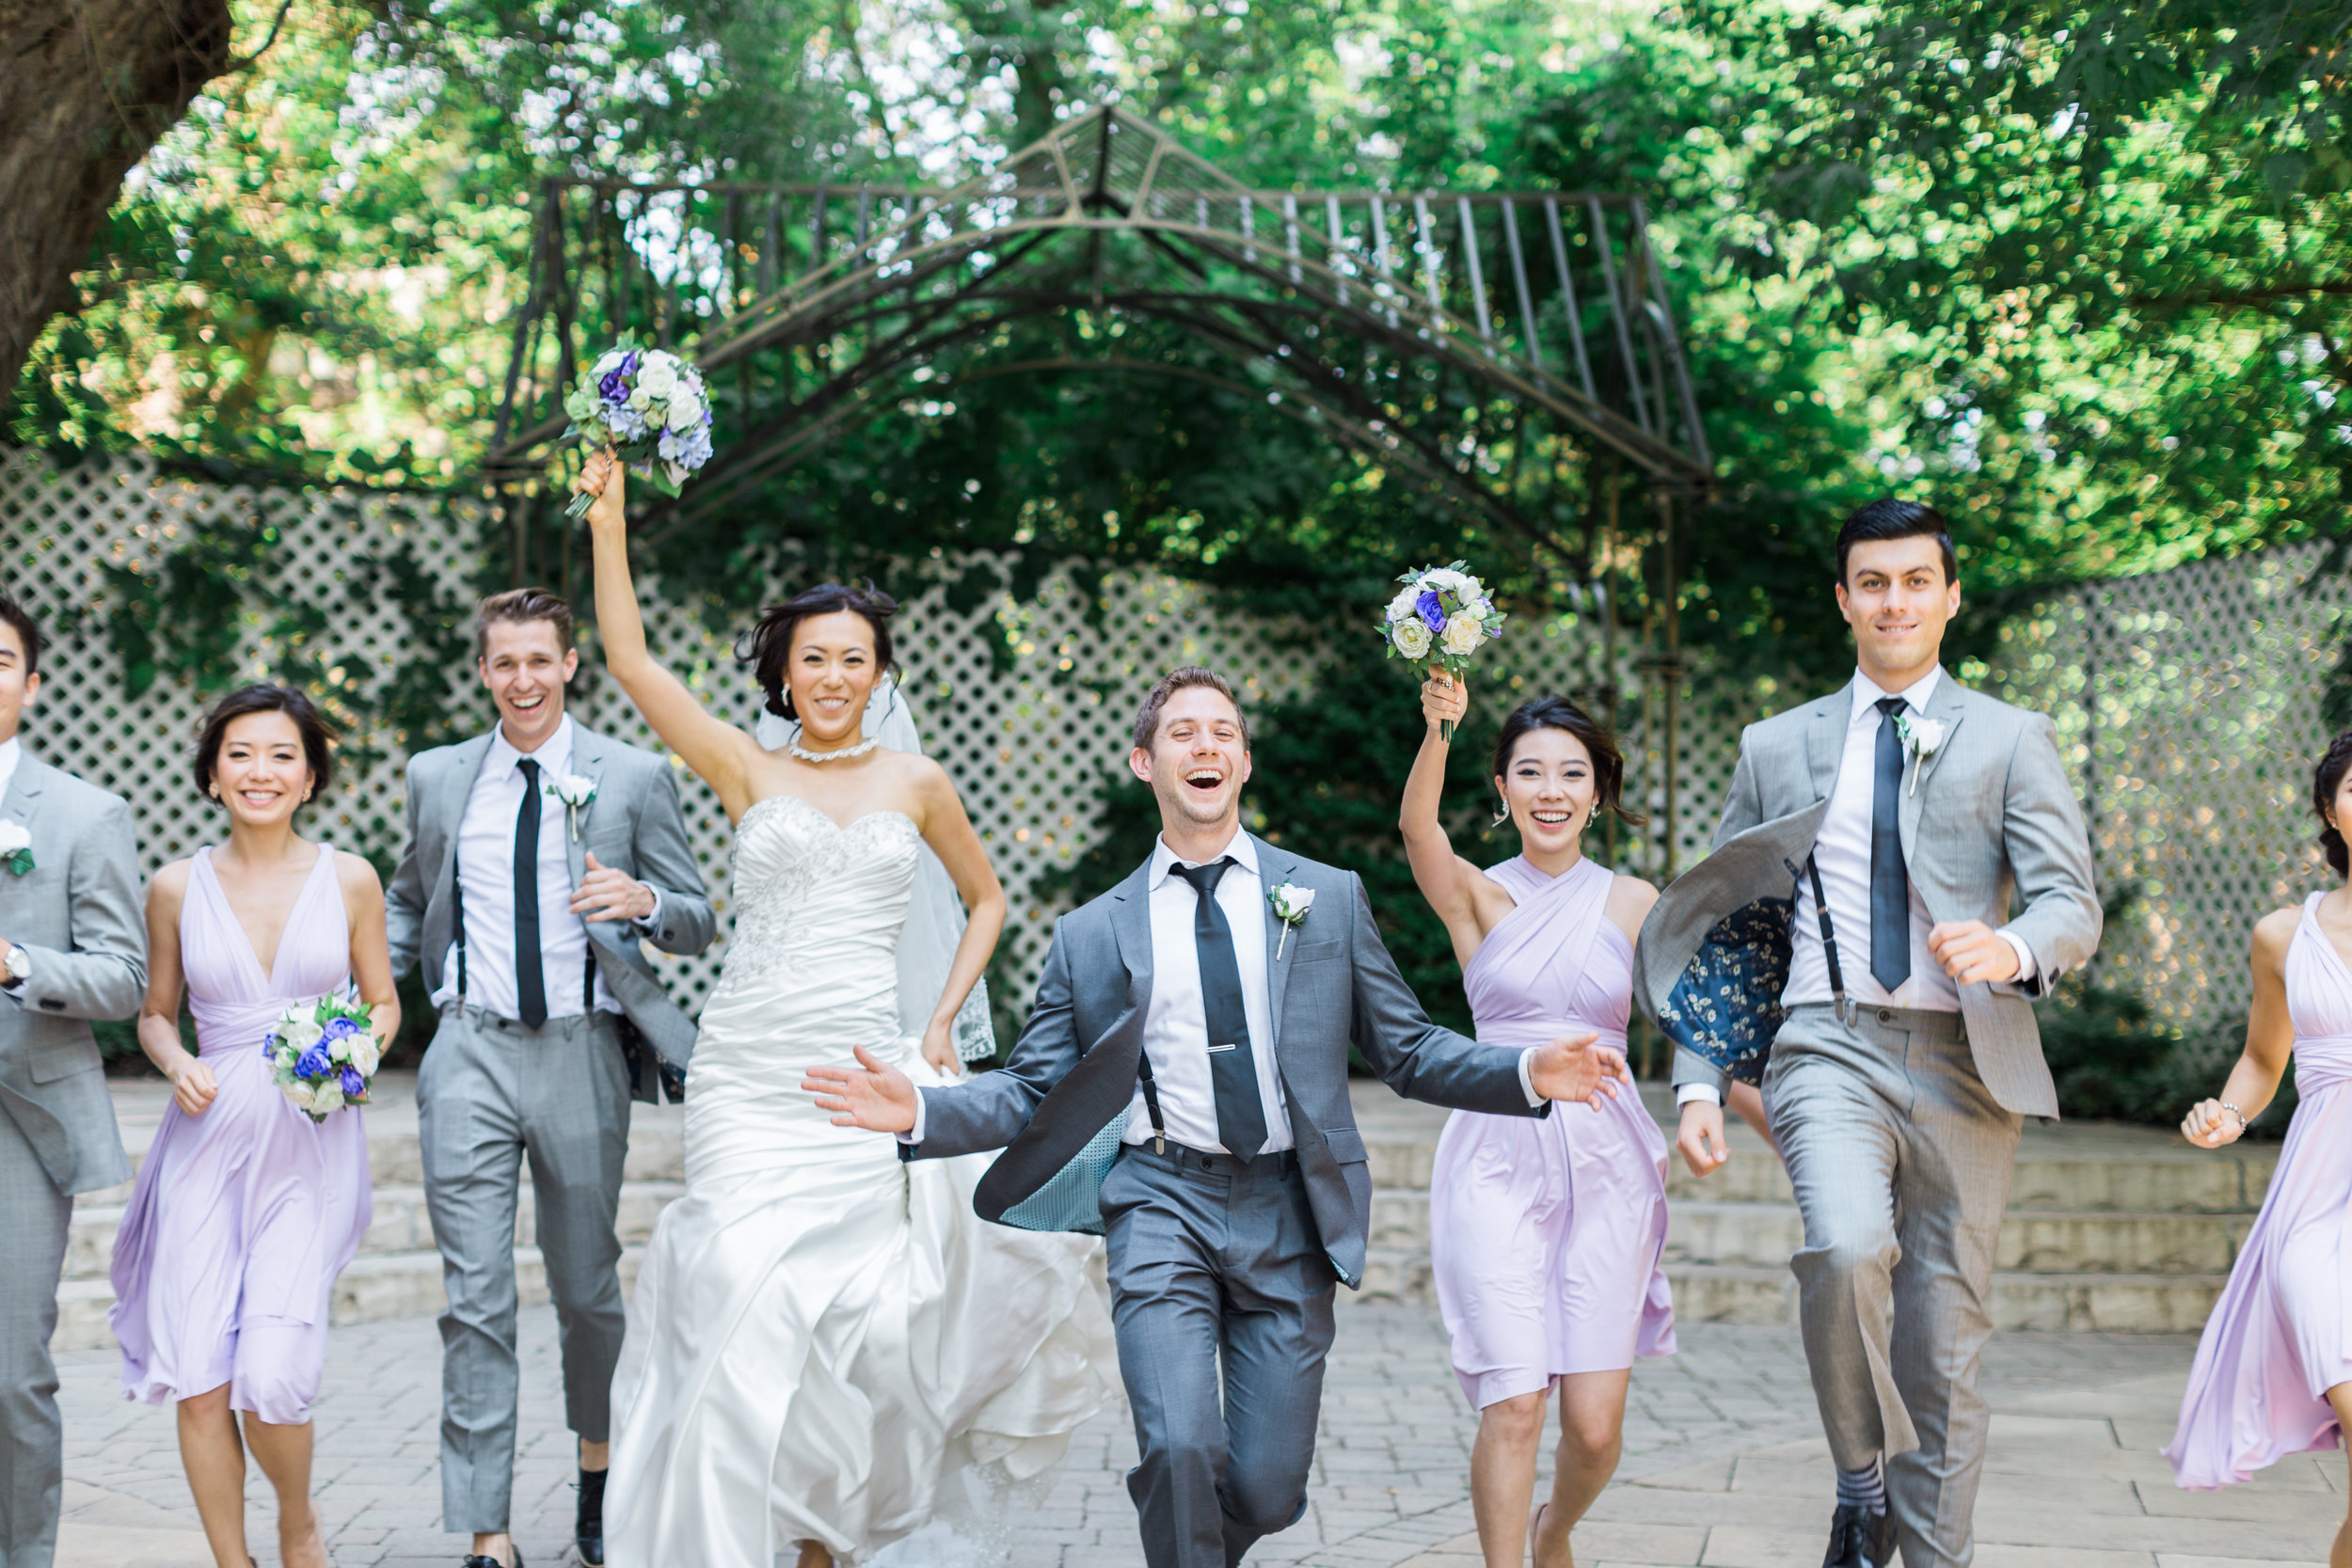 Toronto Fine Art Photographer - Old Mill Wedding - Bridal Party Photos-22.jpg